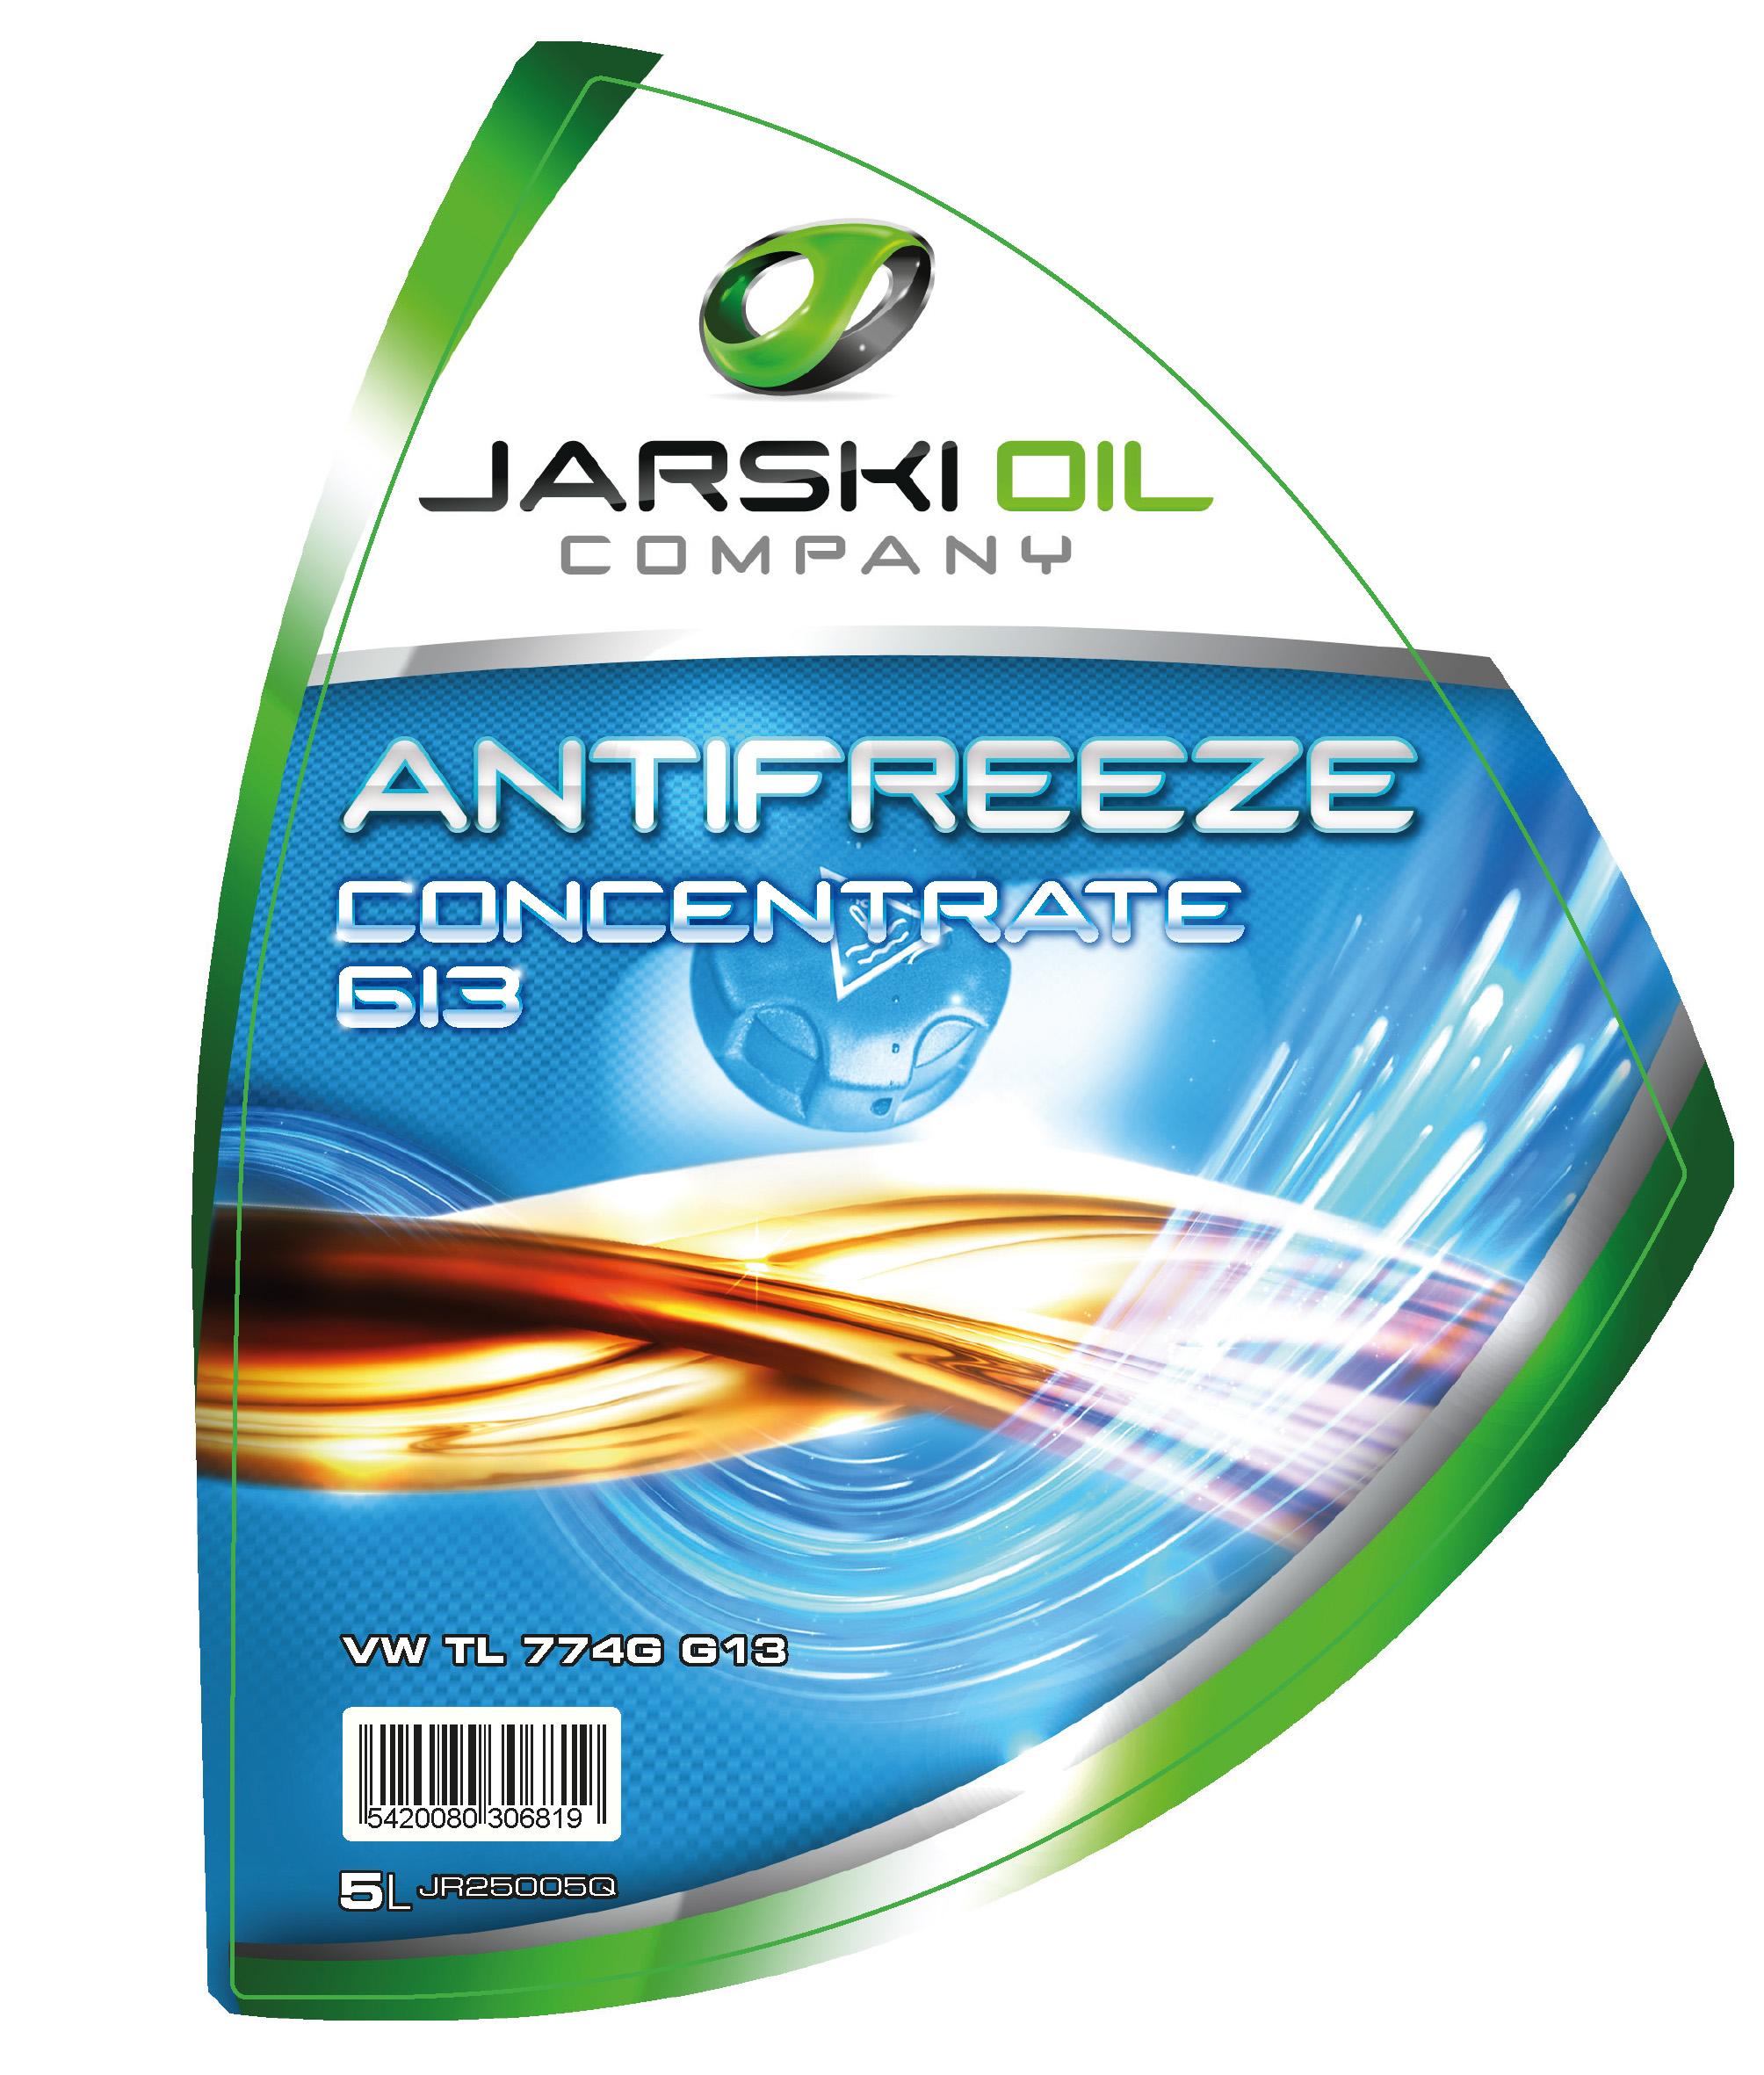 Liquides refroidissement JARSKIOIL JR25005Q d'origine